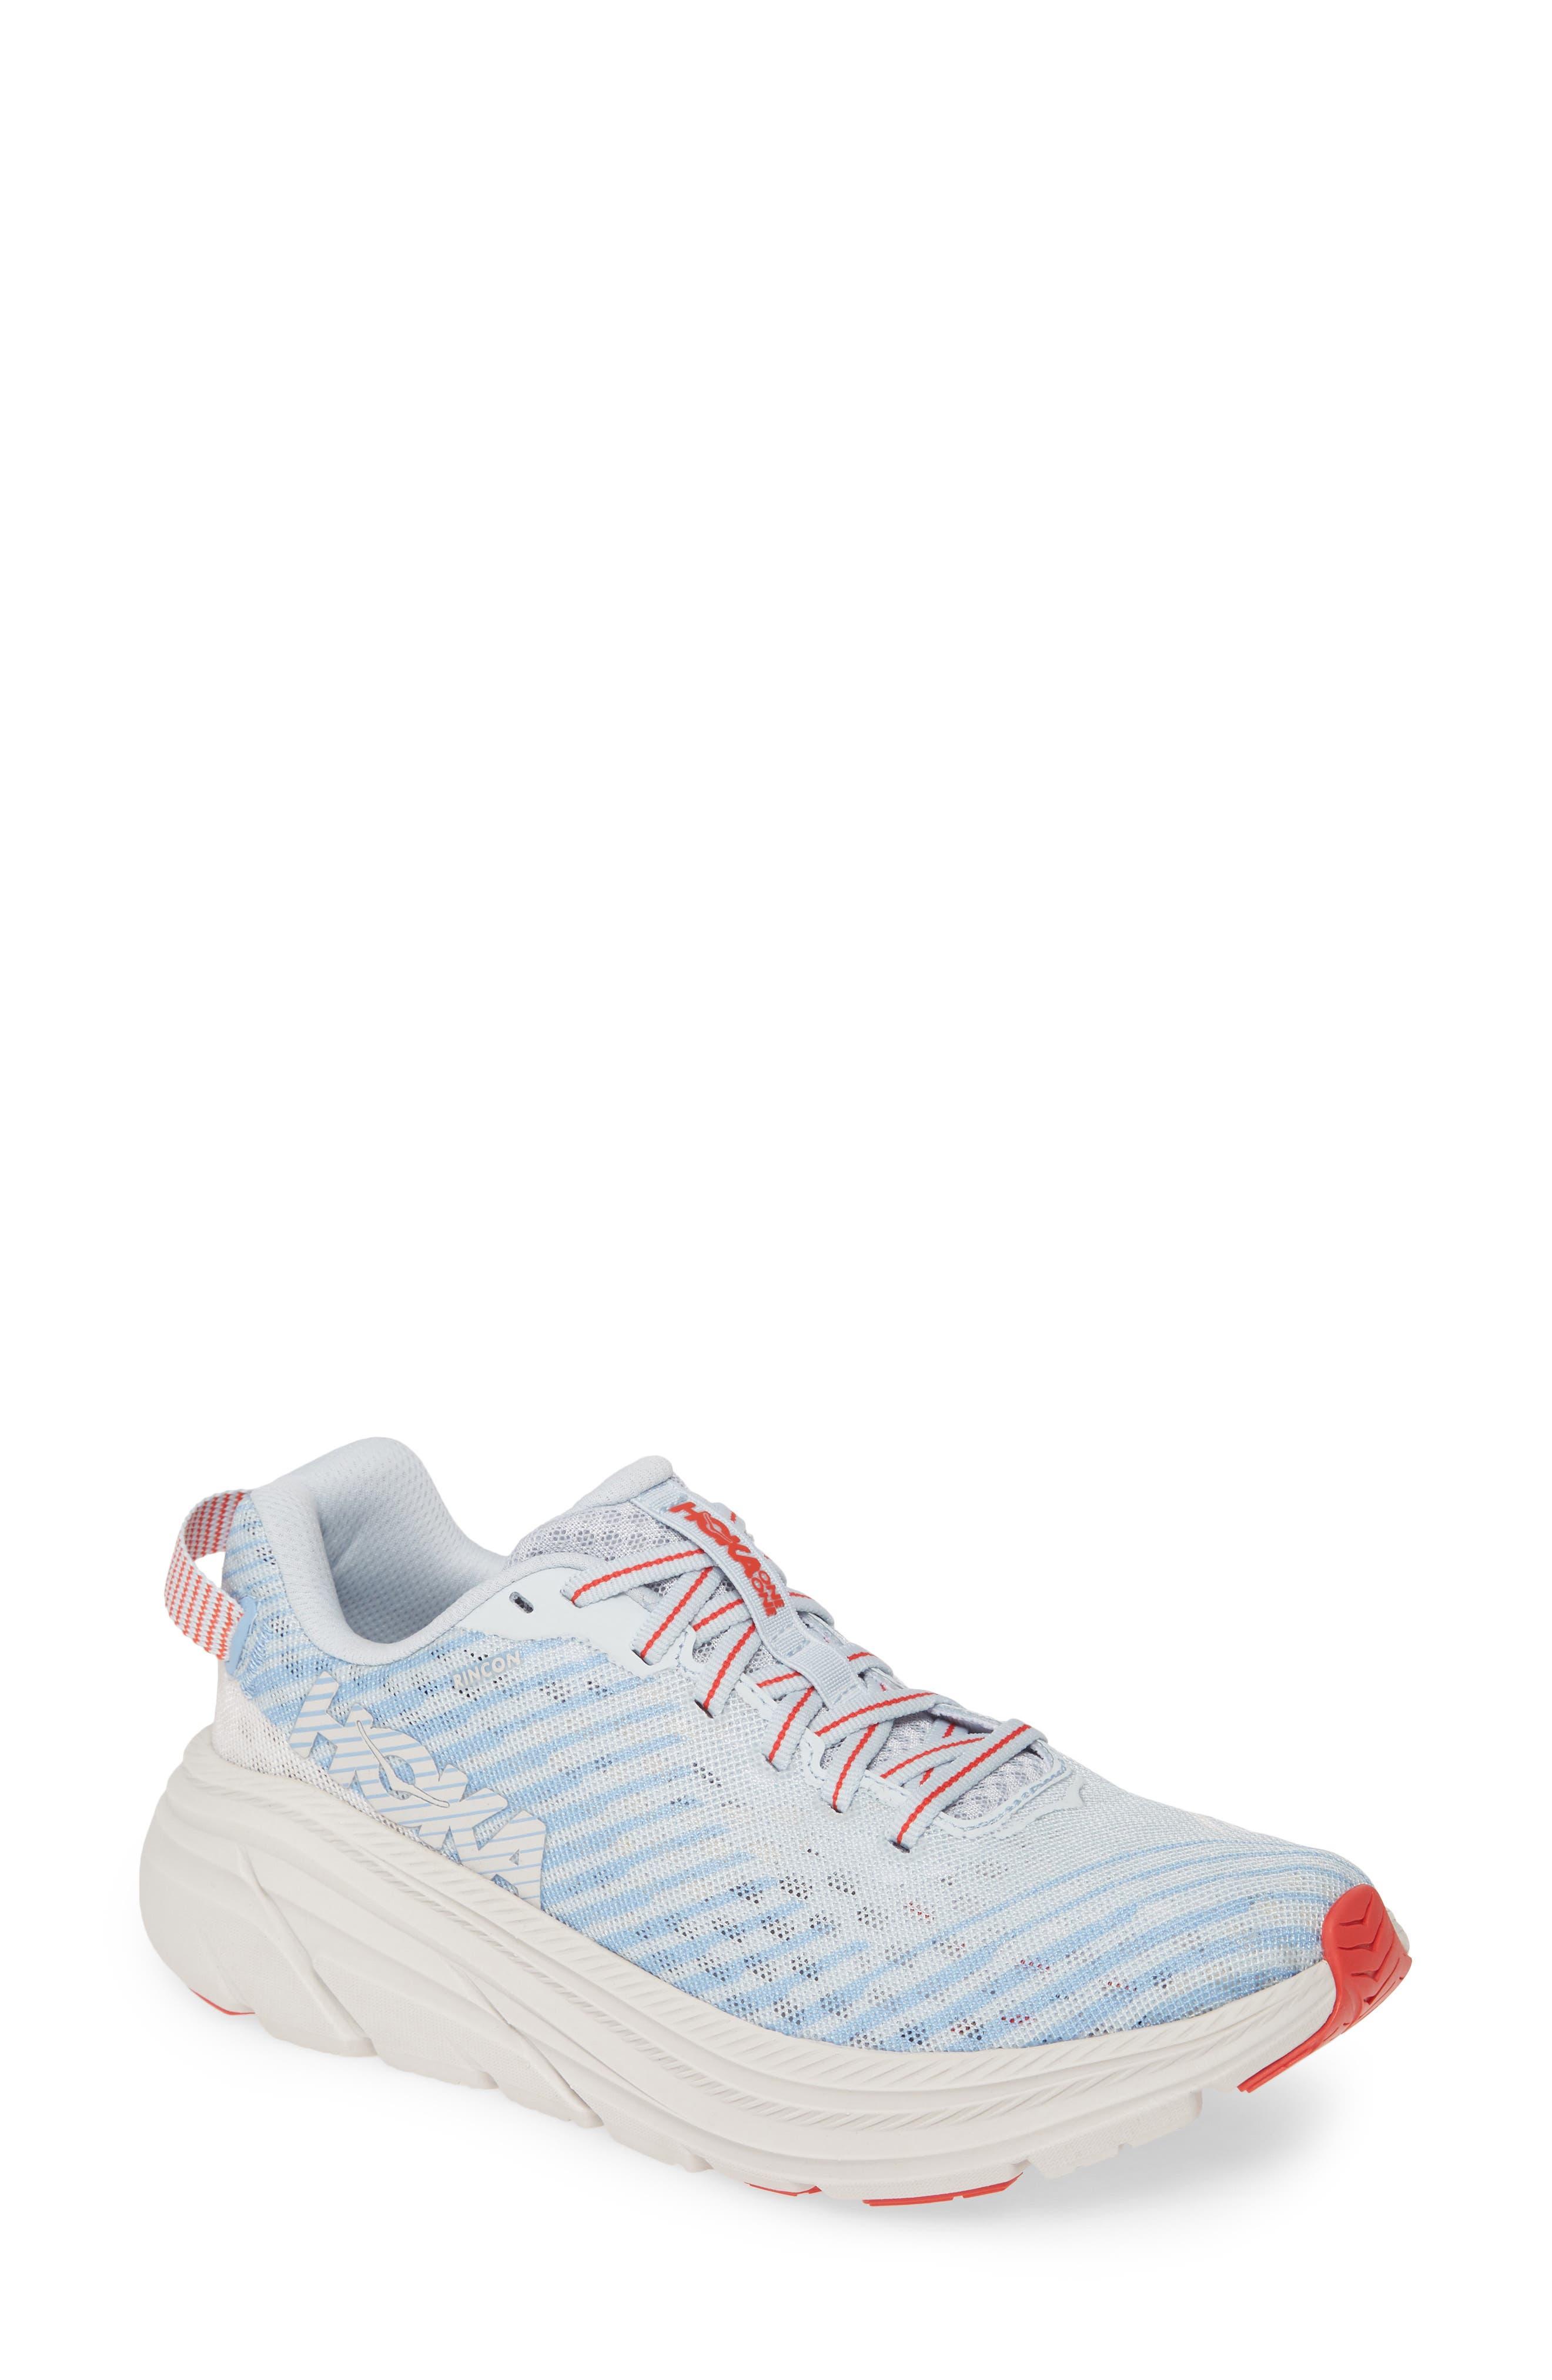 Hoka One One Rincon Running Shoe- Blue